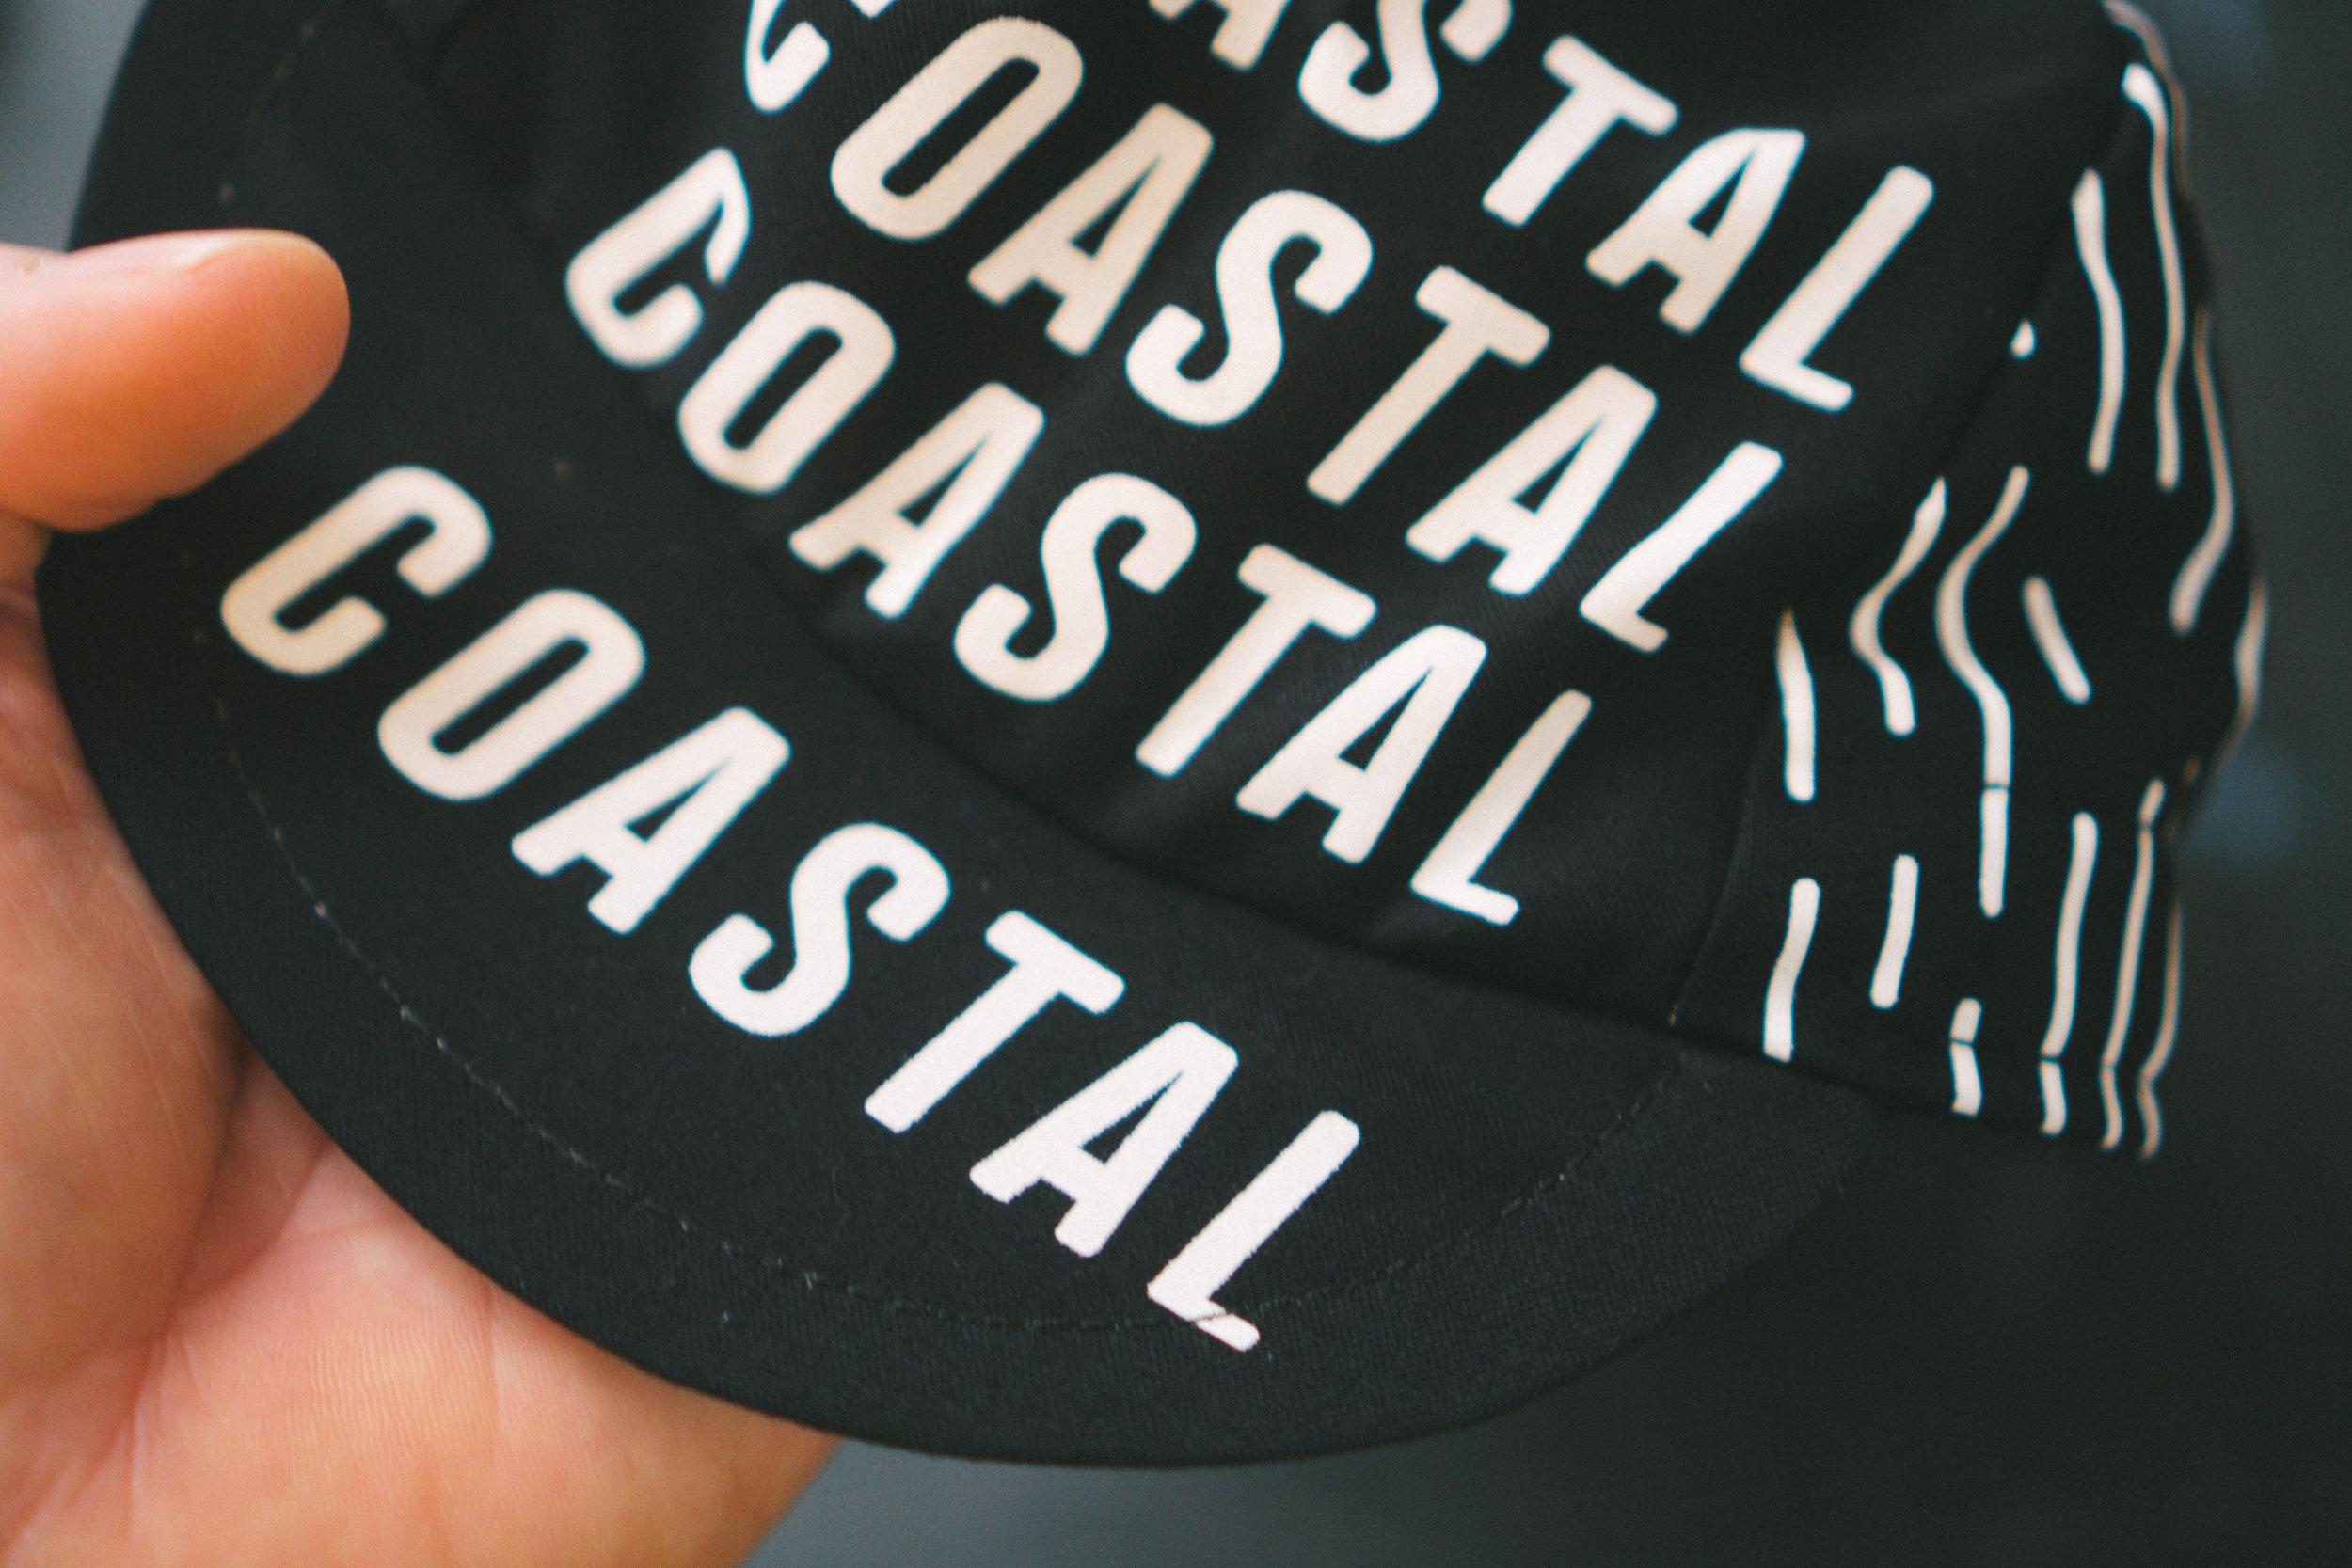 Coastal_Cycling_Caps_Rothera_9.jpg